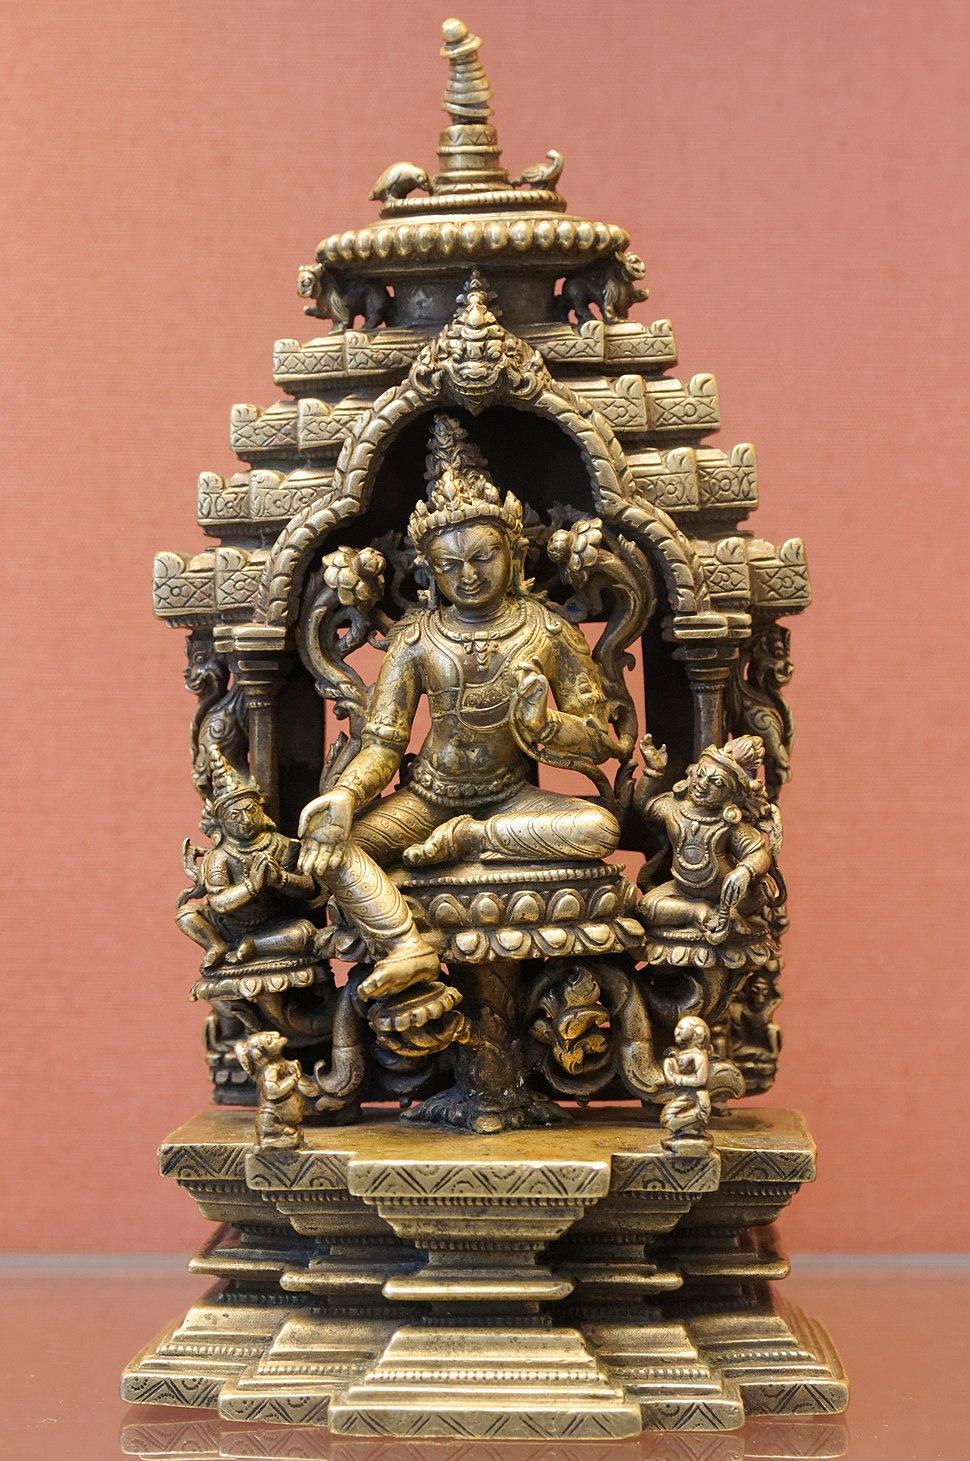 Seated Avalokiteshvara BM OA 1985.5-11.1